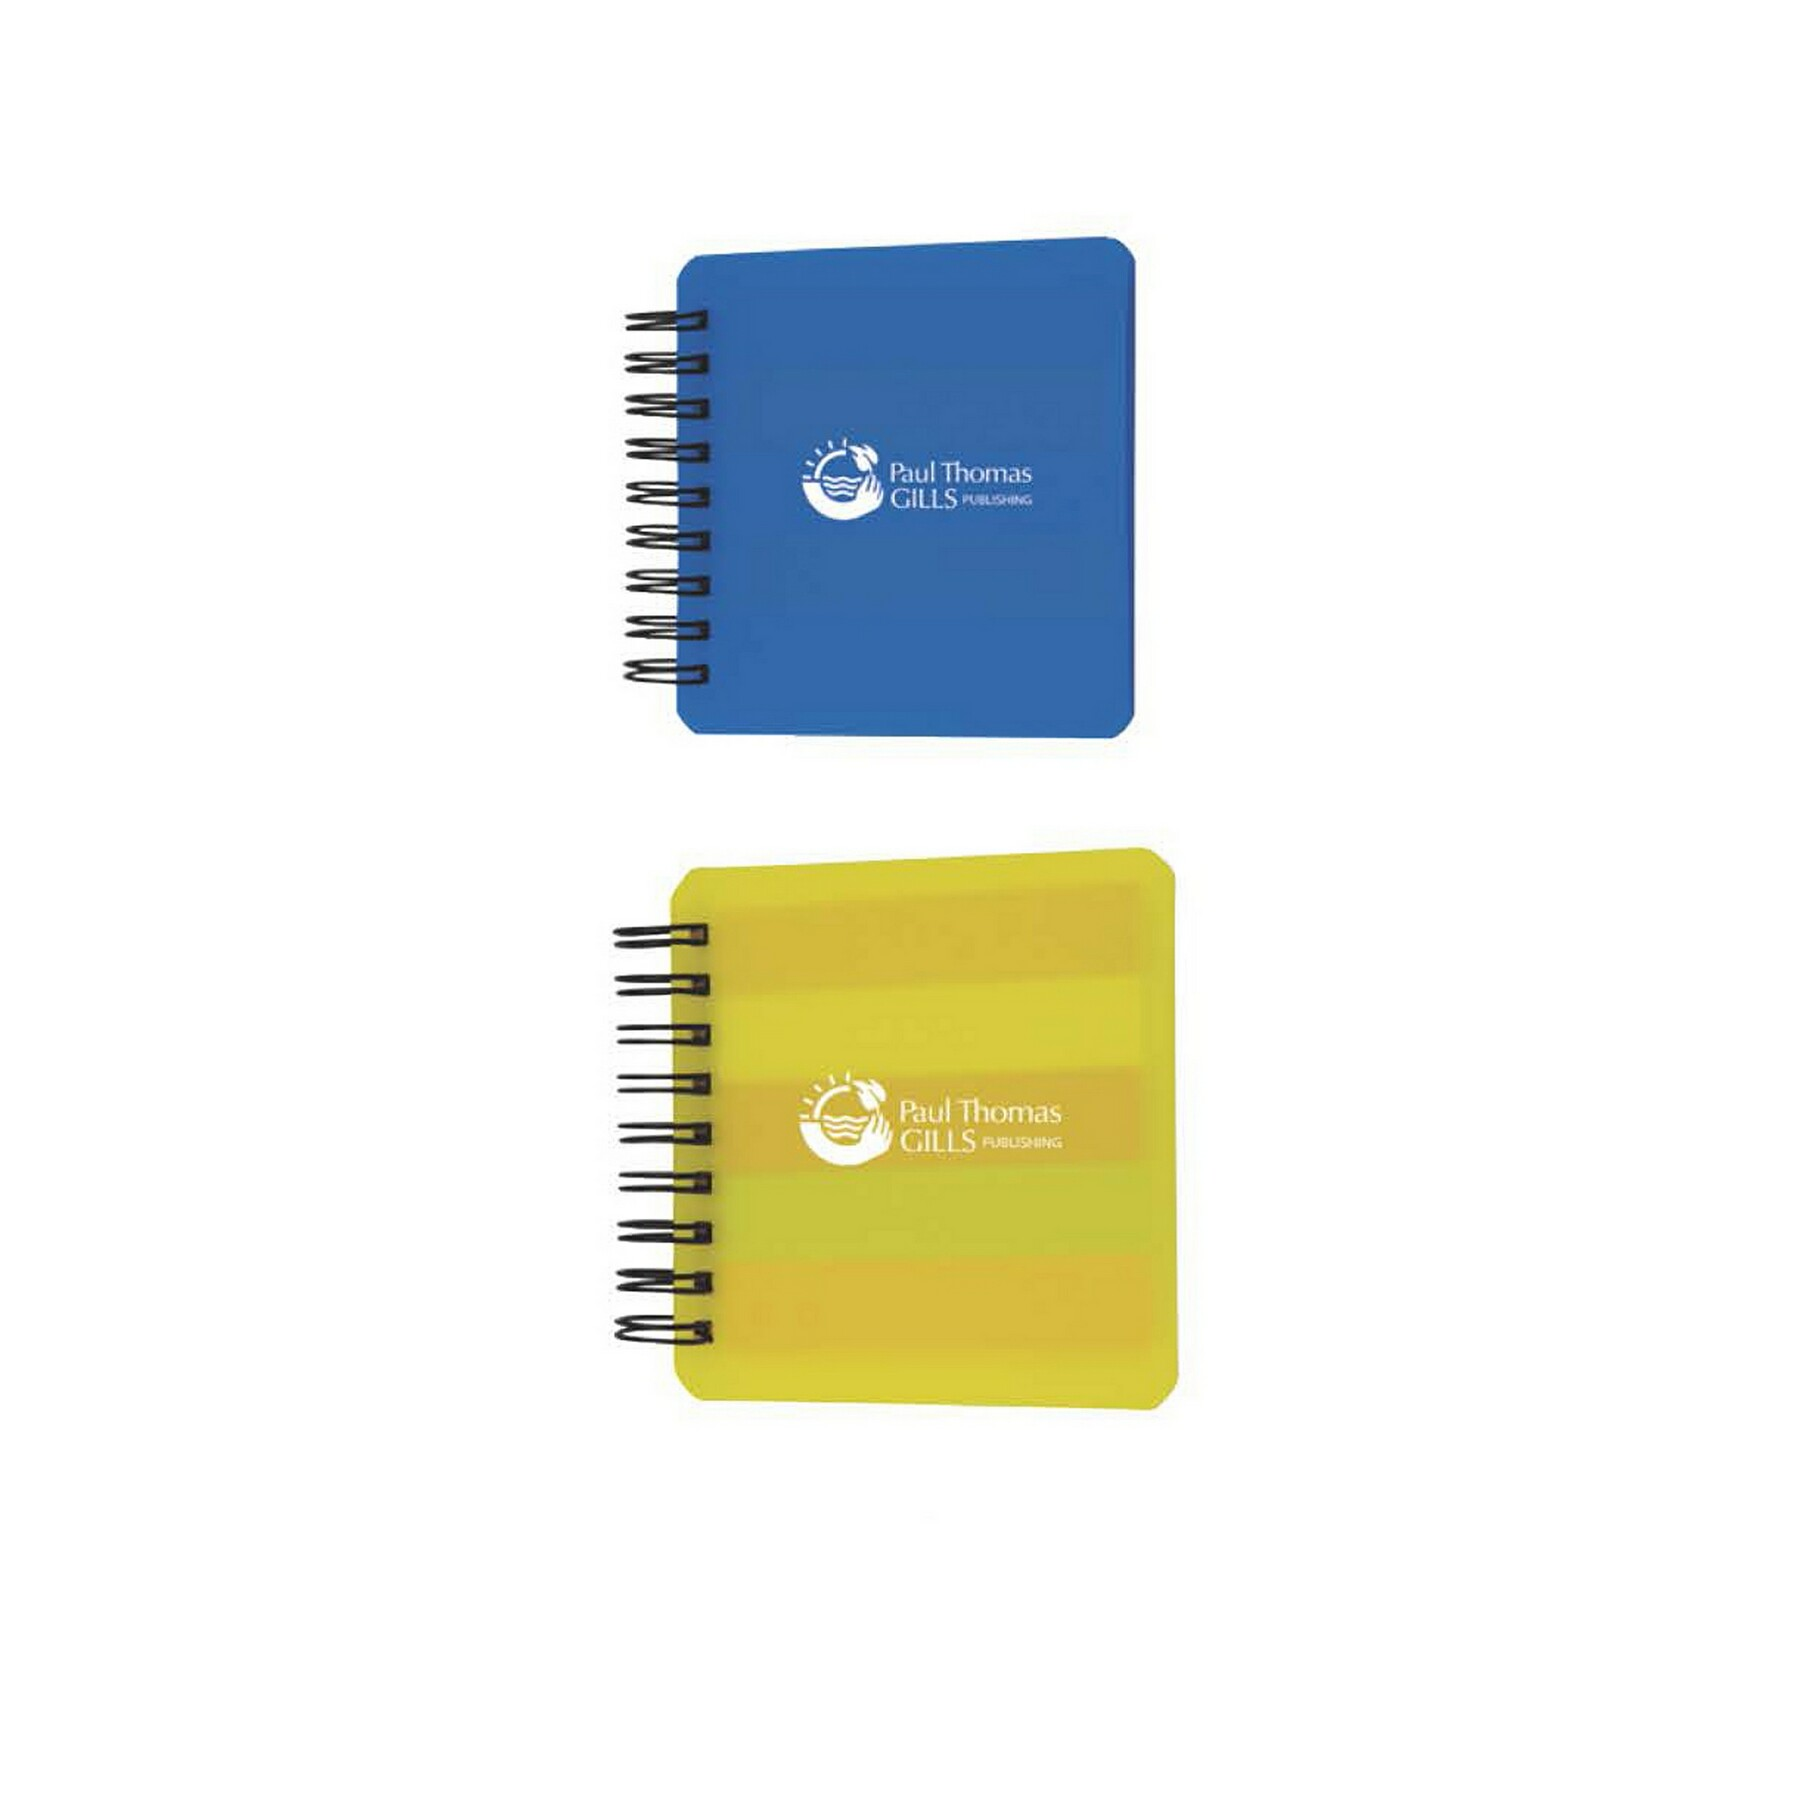 BIC Adhesive Memo Notepad, #PFN, 1 Colour Imprint